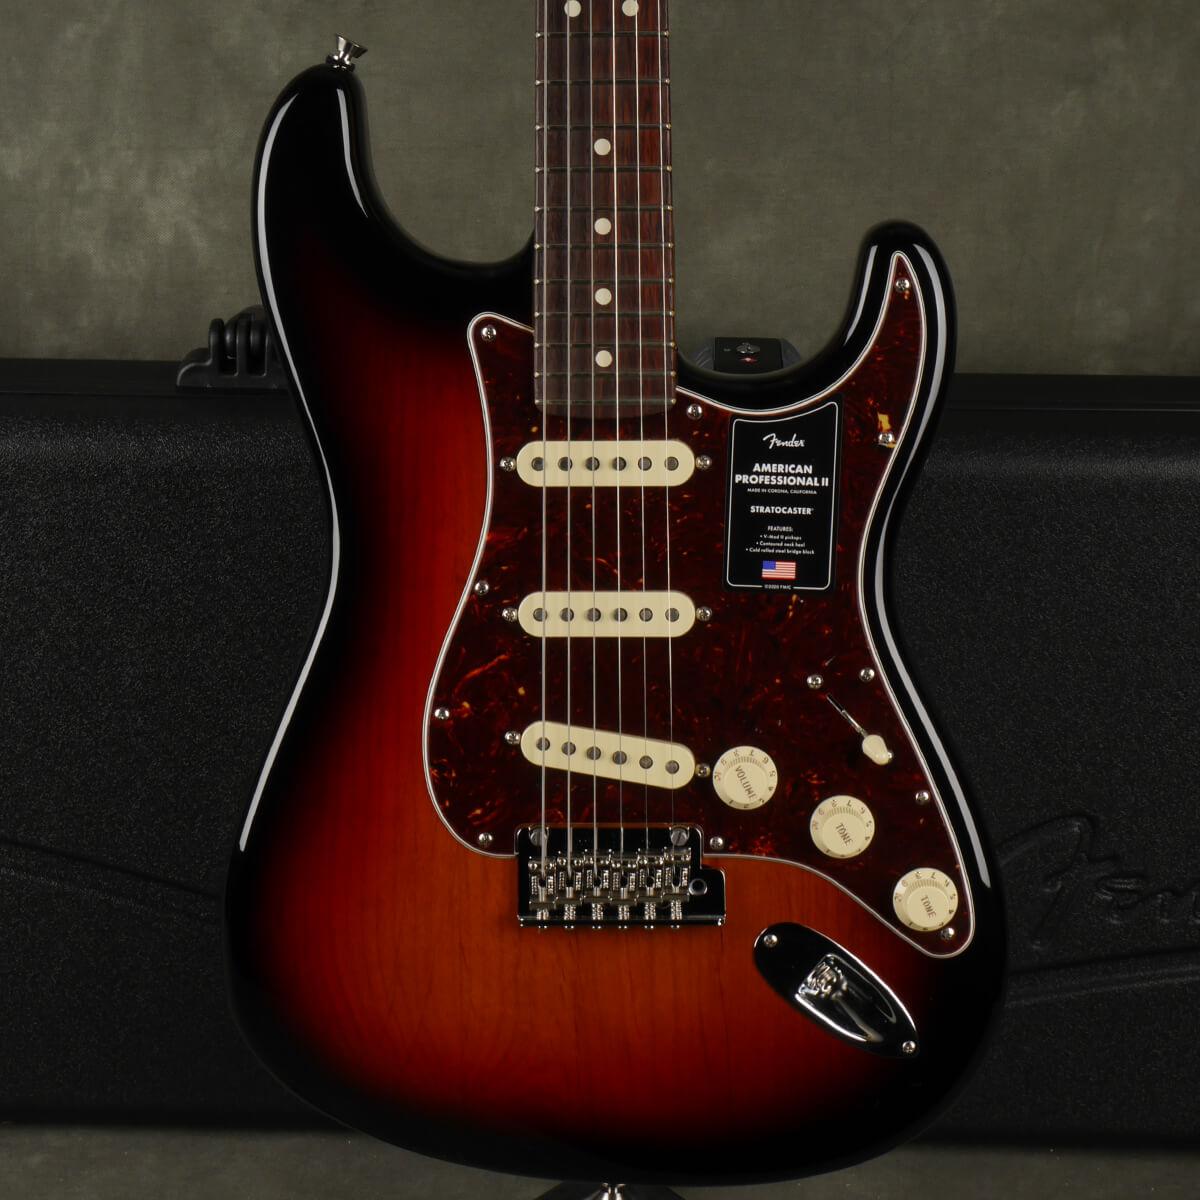 Fender American Pro II Stratocaster - 3-Tone Sunburst w/Hard Case - 2nd Hand